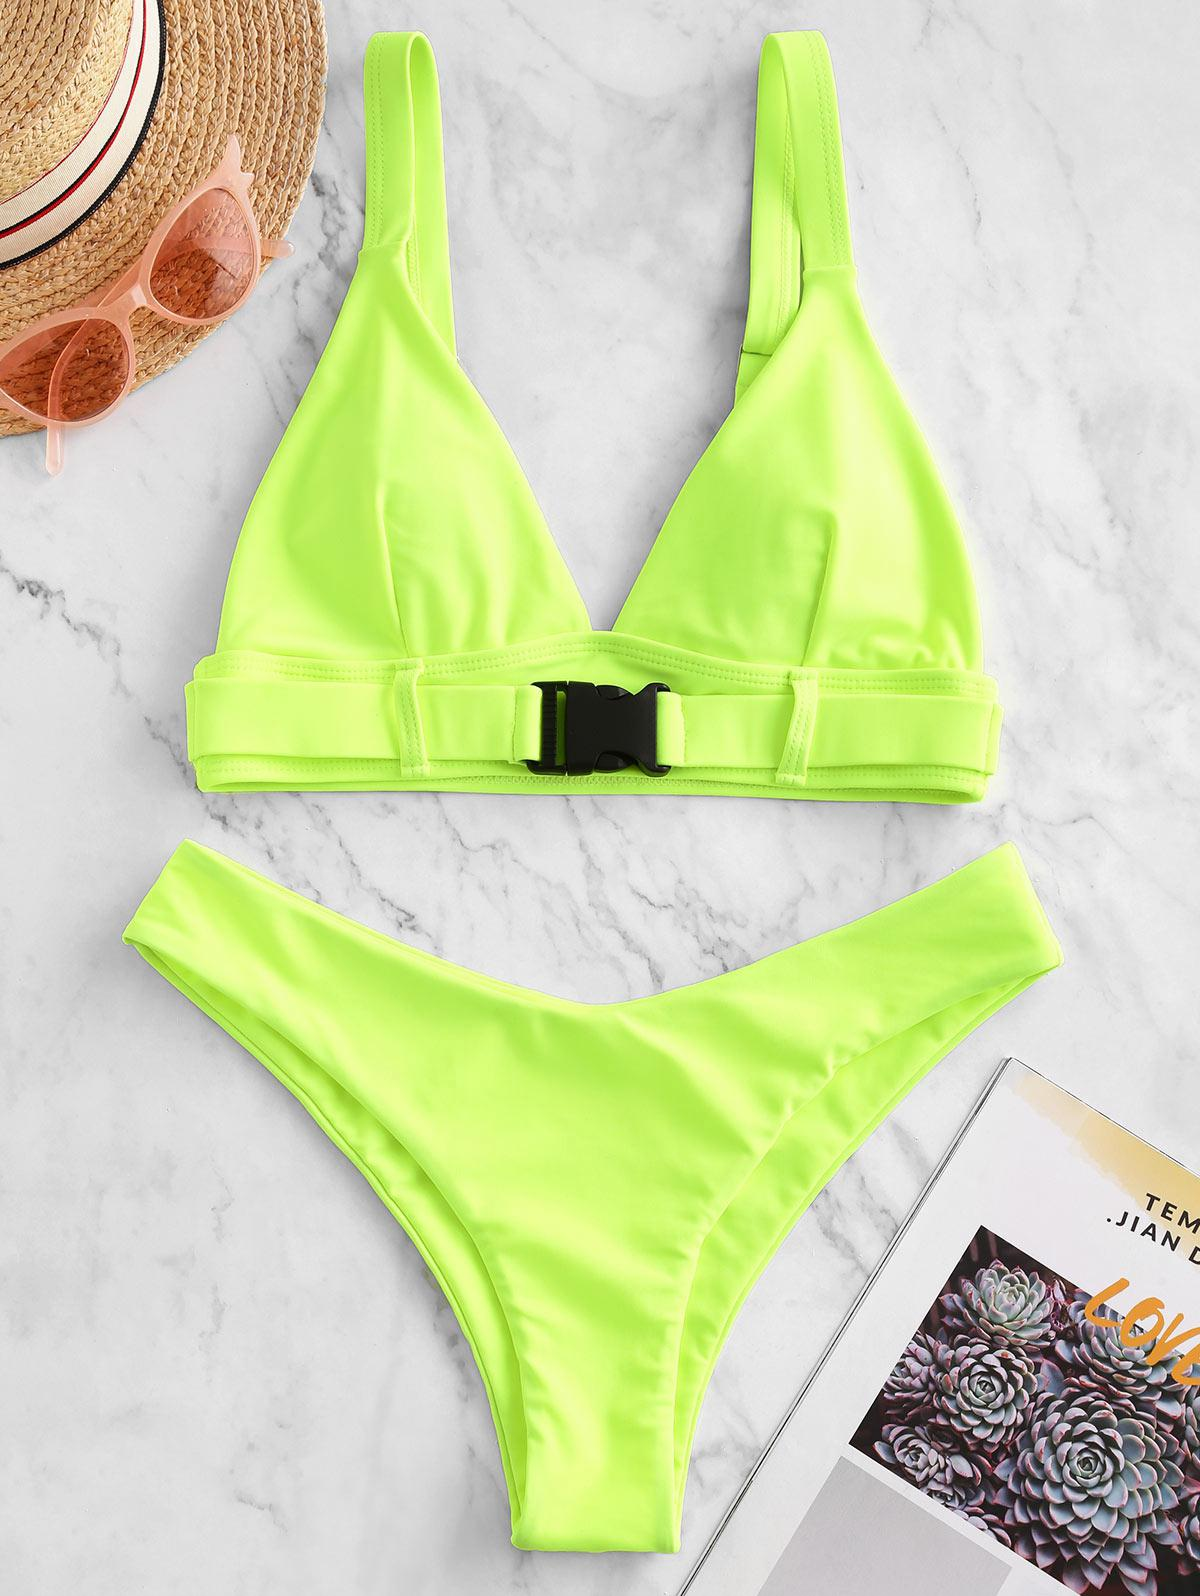 ZAFUL Push Buckle High Leg Plunging Bikini Swimsuit, Chartreuse